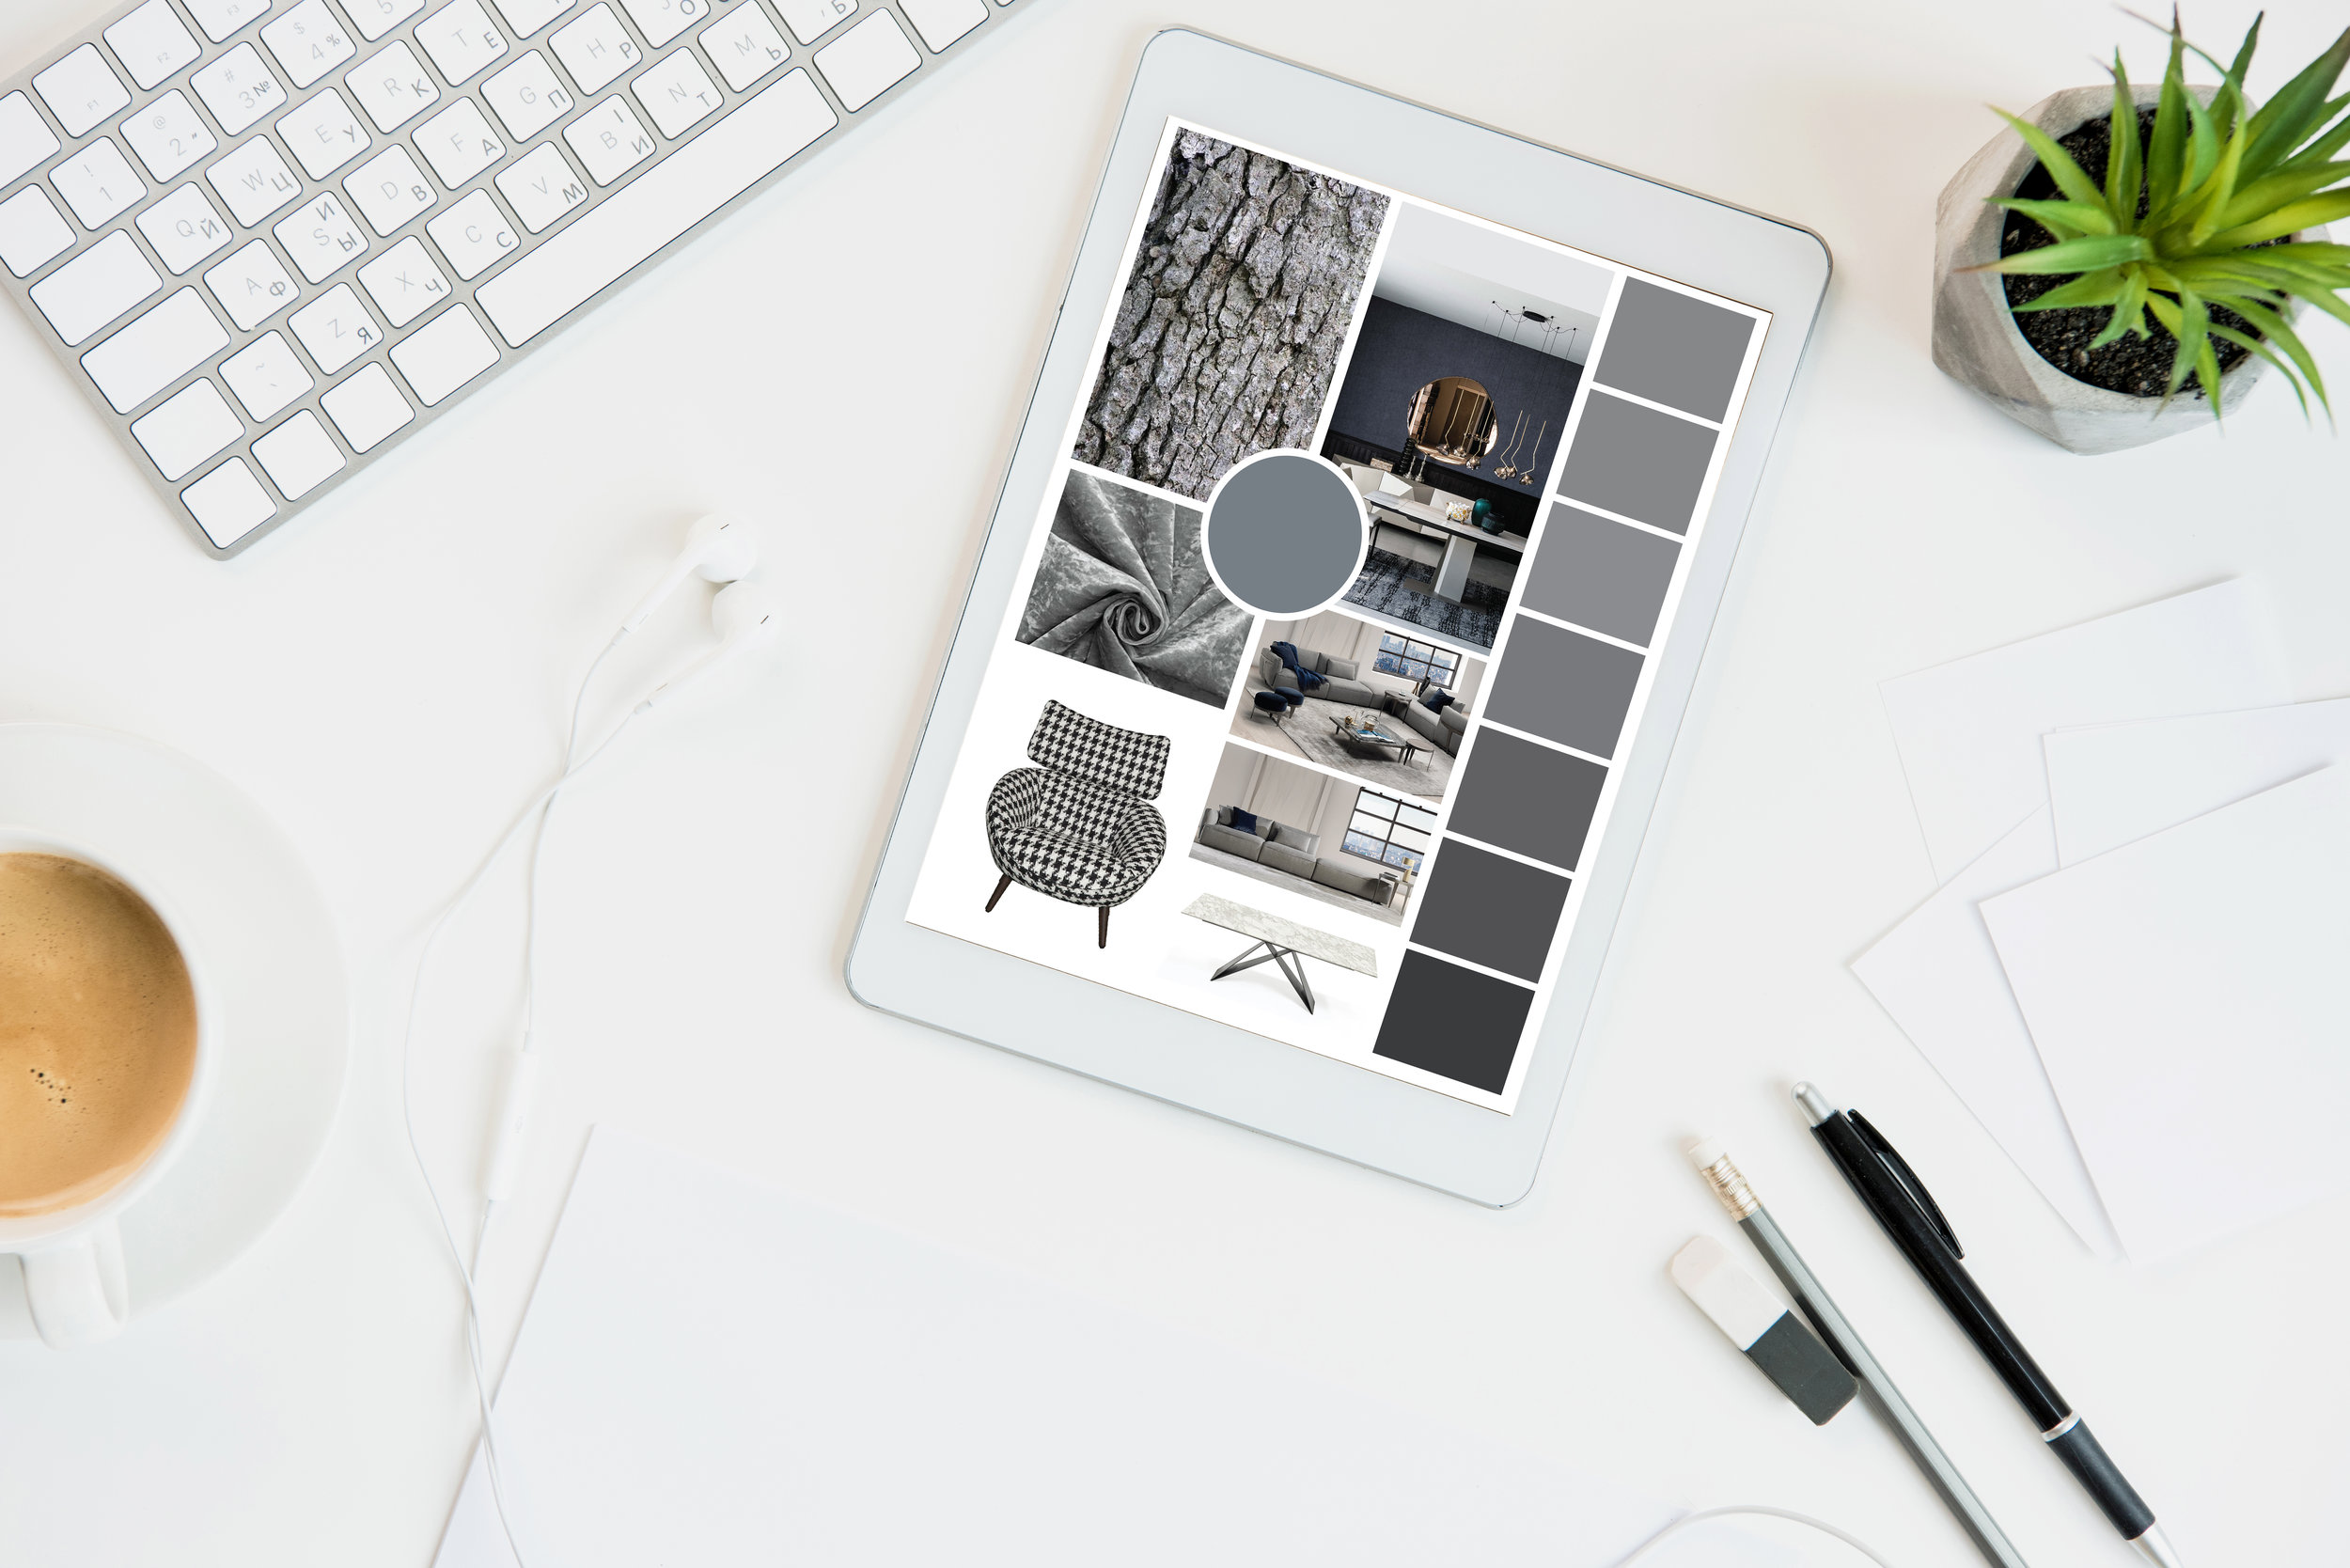 InteriorDesign_MoodBoard_Mockup2.jpg